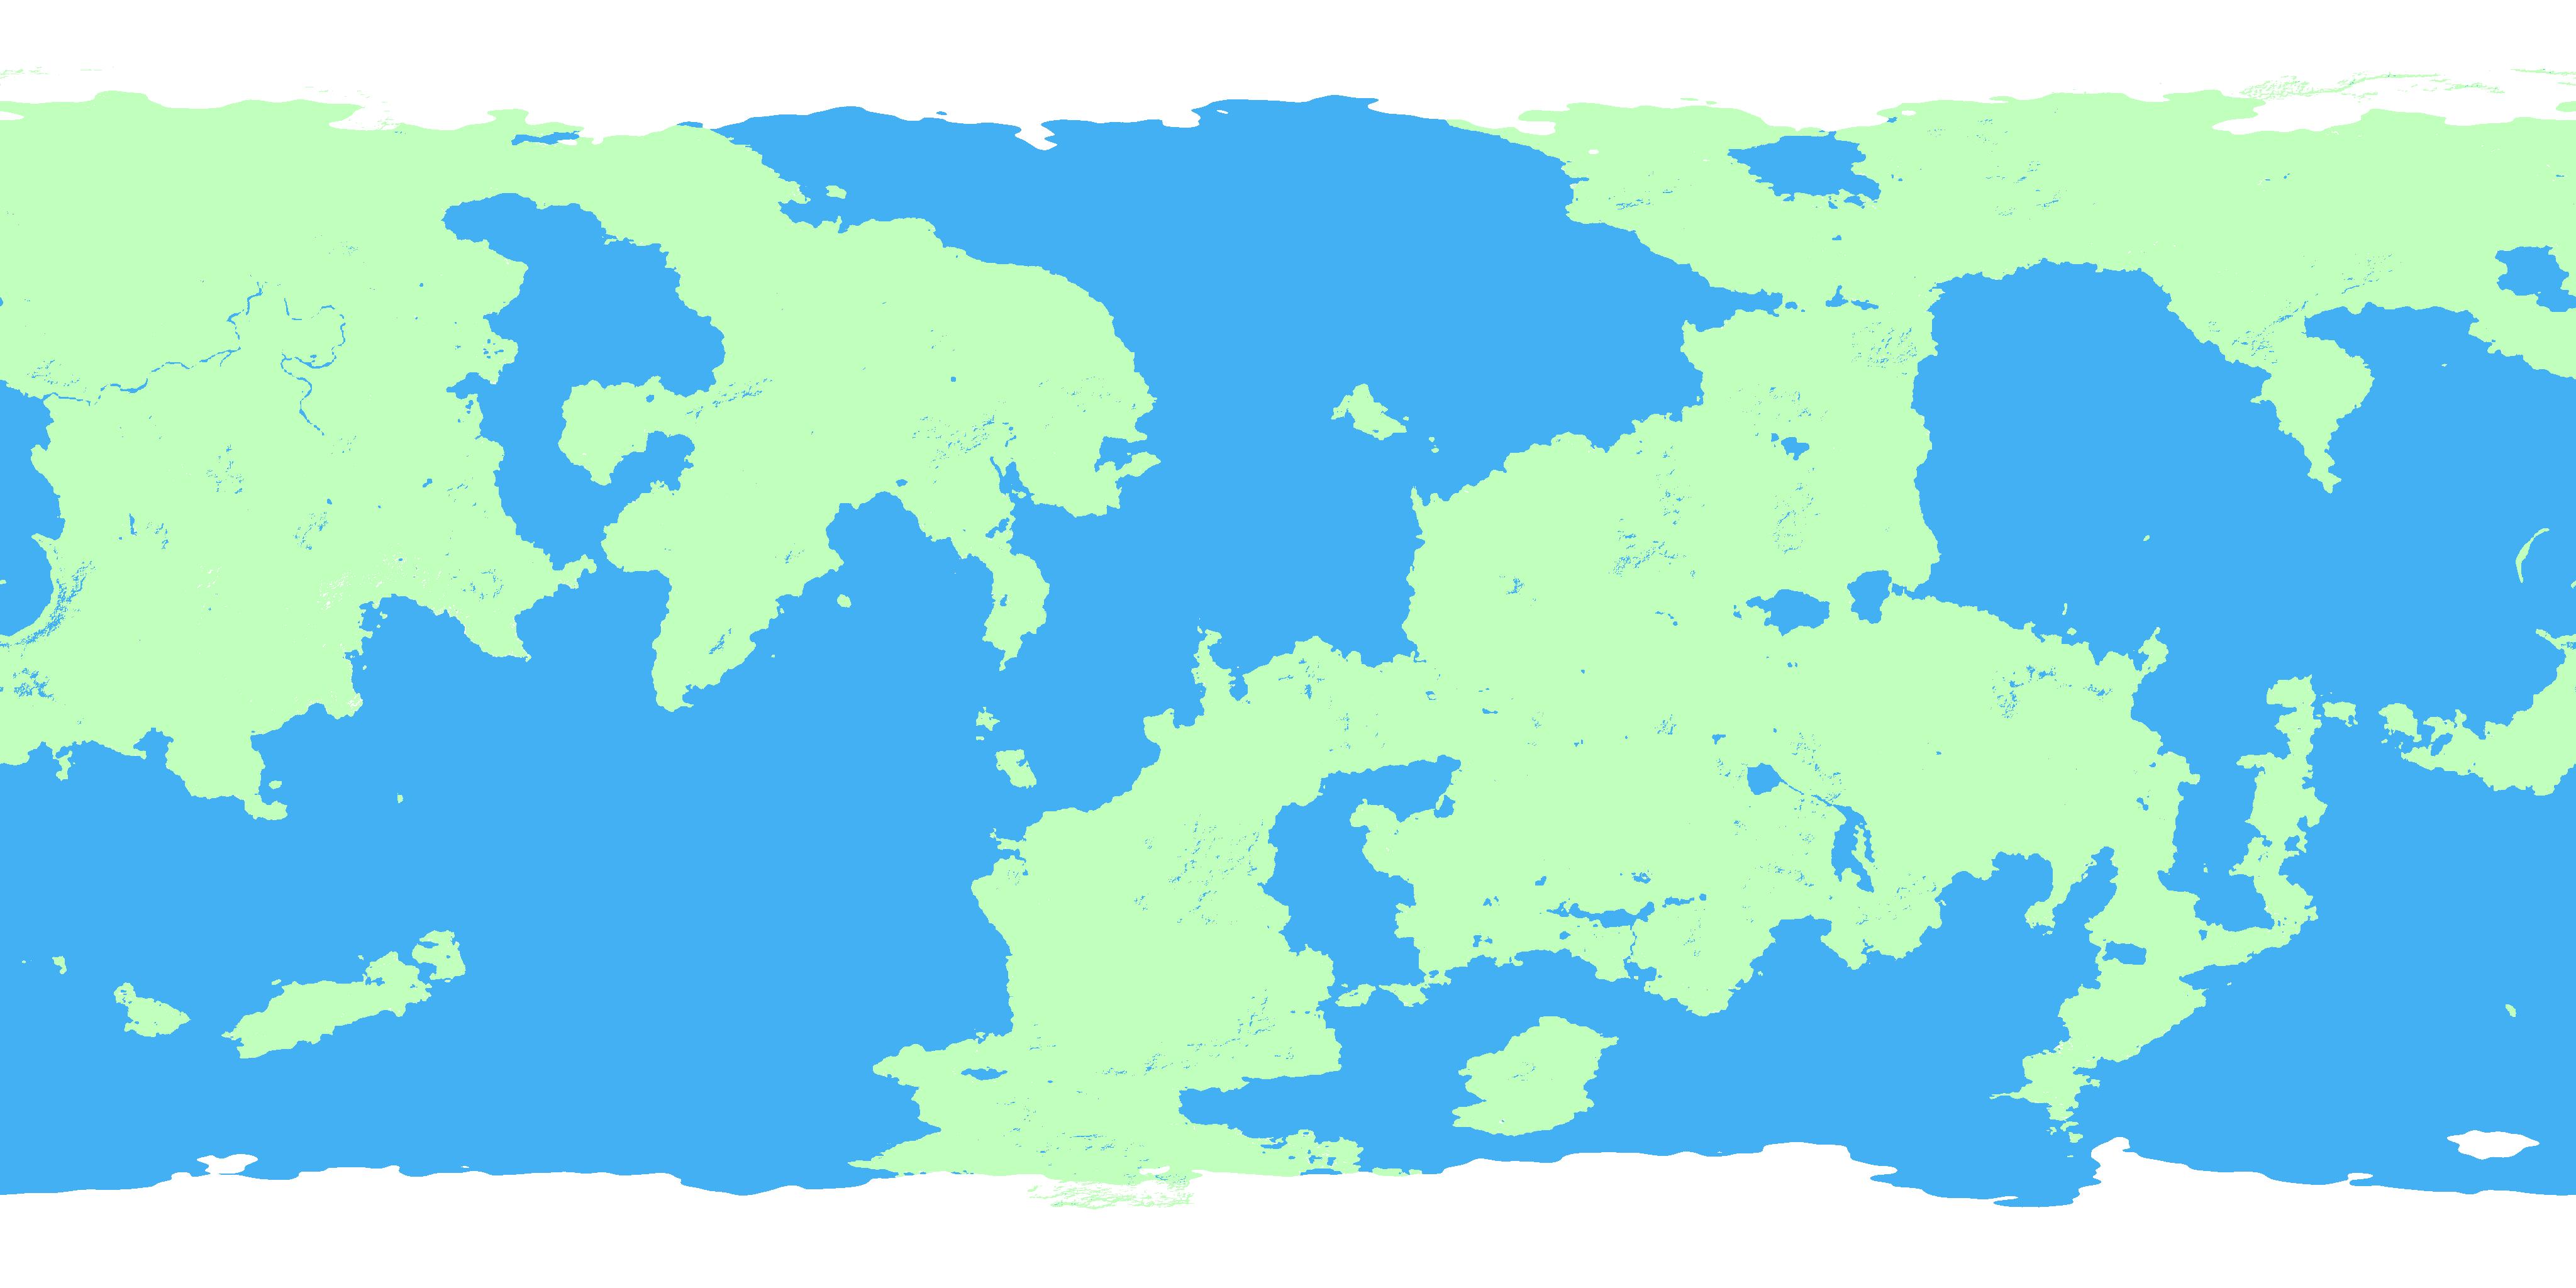 KSP Maps by hgfggg on DeviantArt Ksp Map on kci map, ksc map, ktx map, kerbal map,